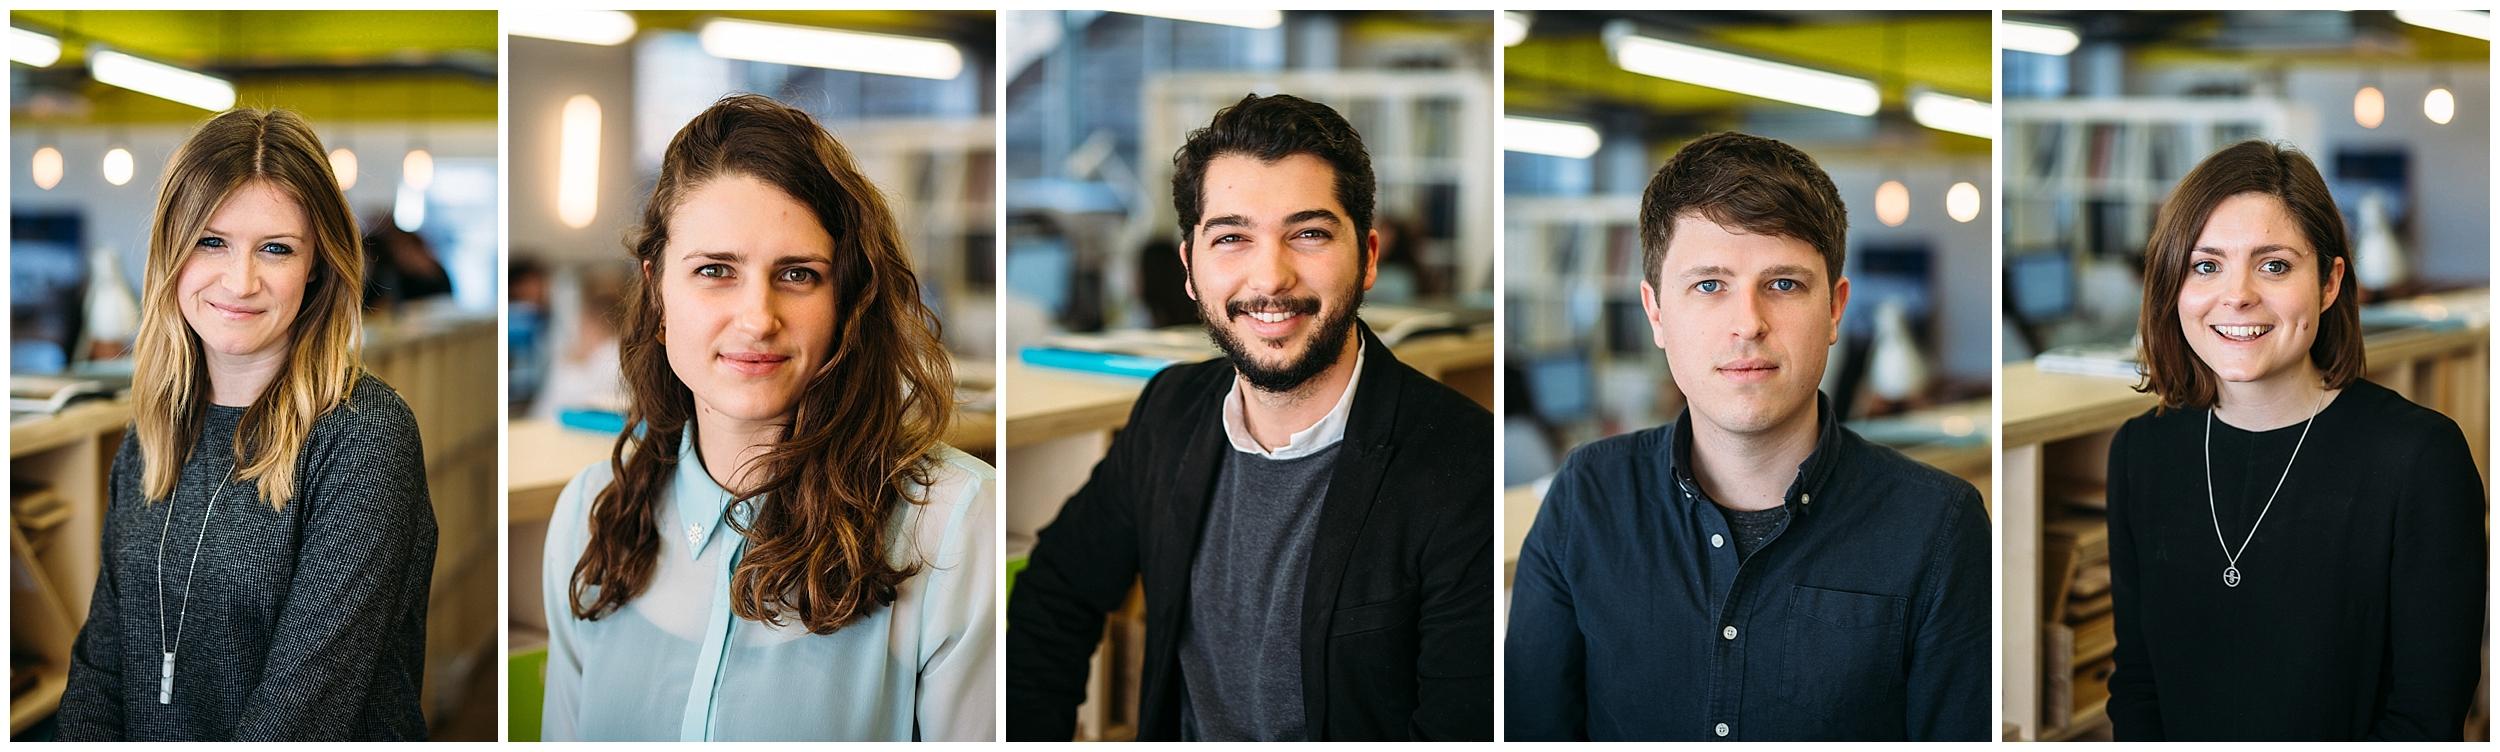 Staff portraits for Tigg Coll Architects